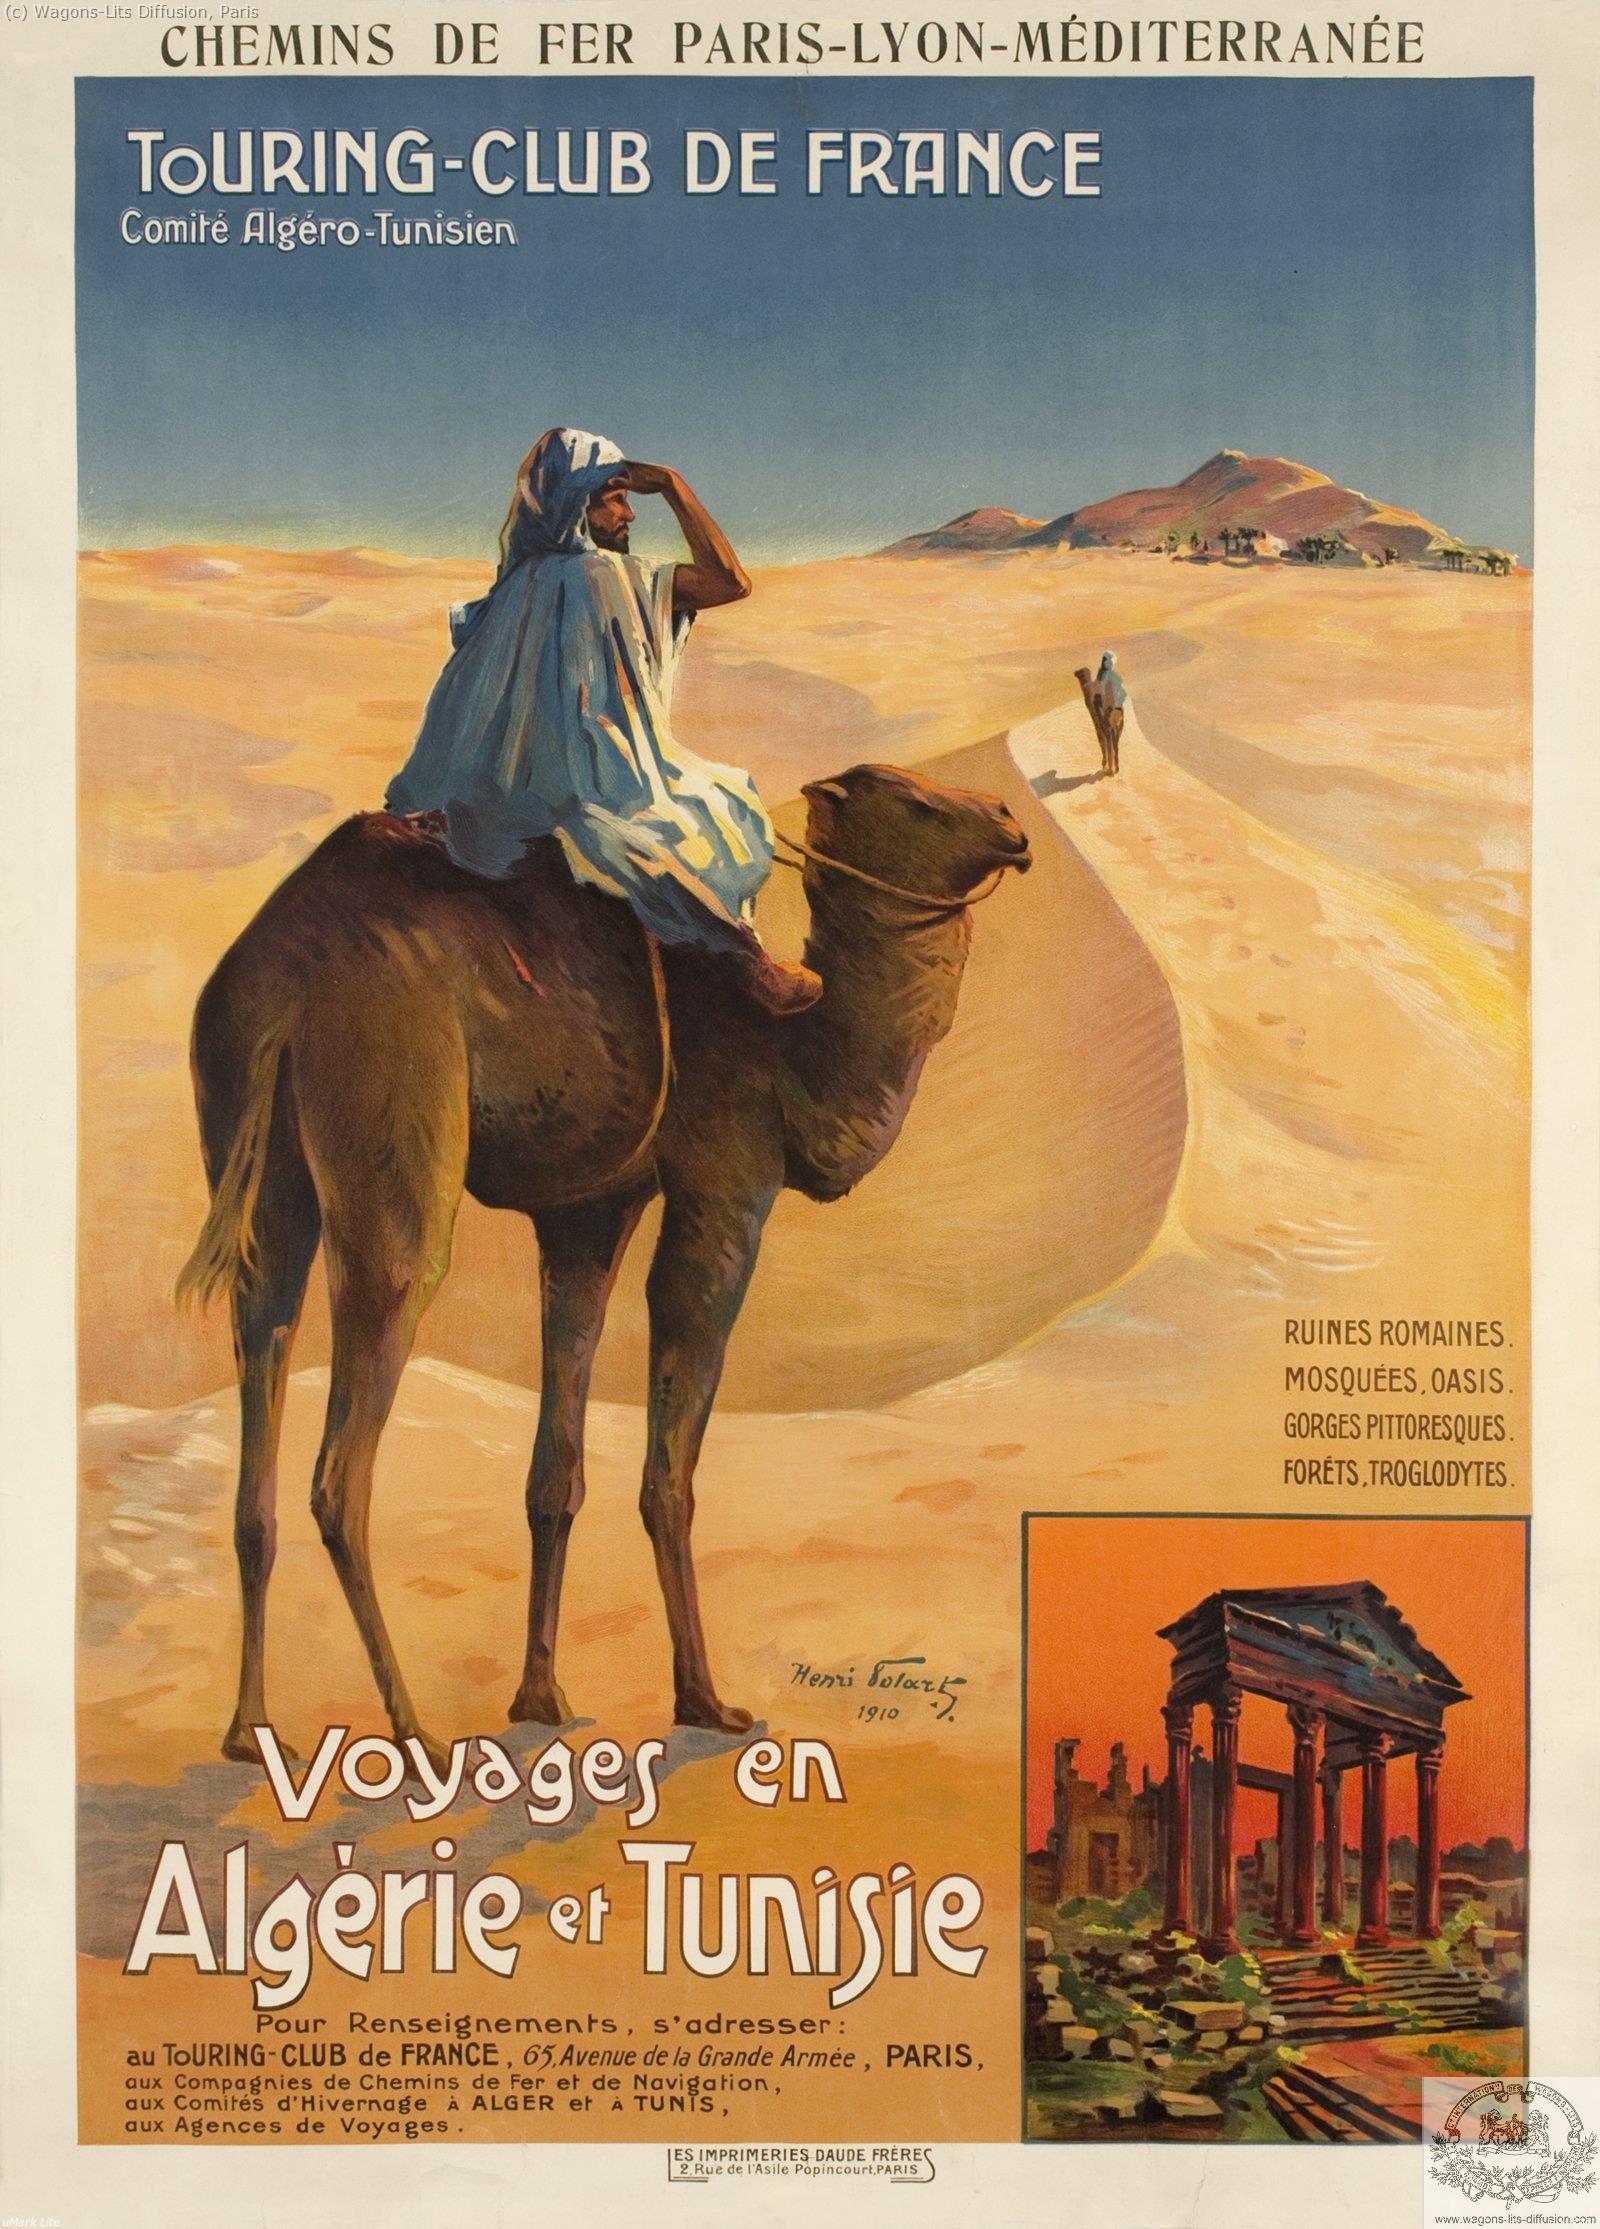 PLM voyages en algerie et tunisie  Ref 1033